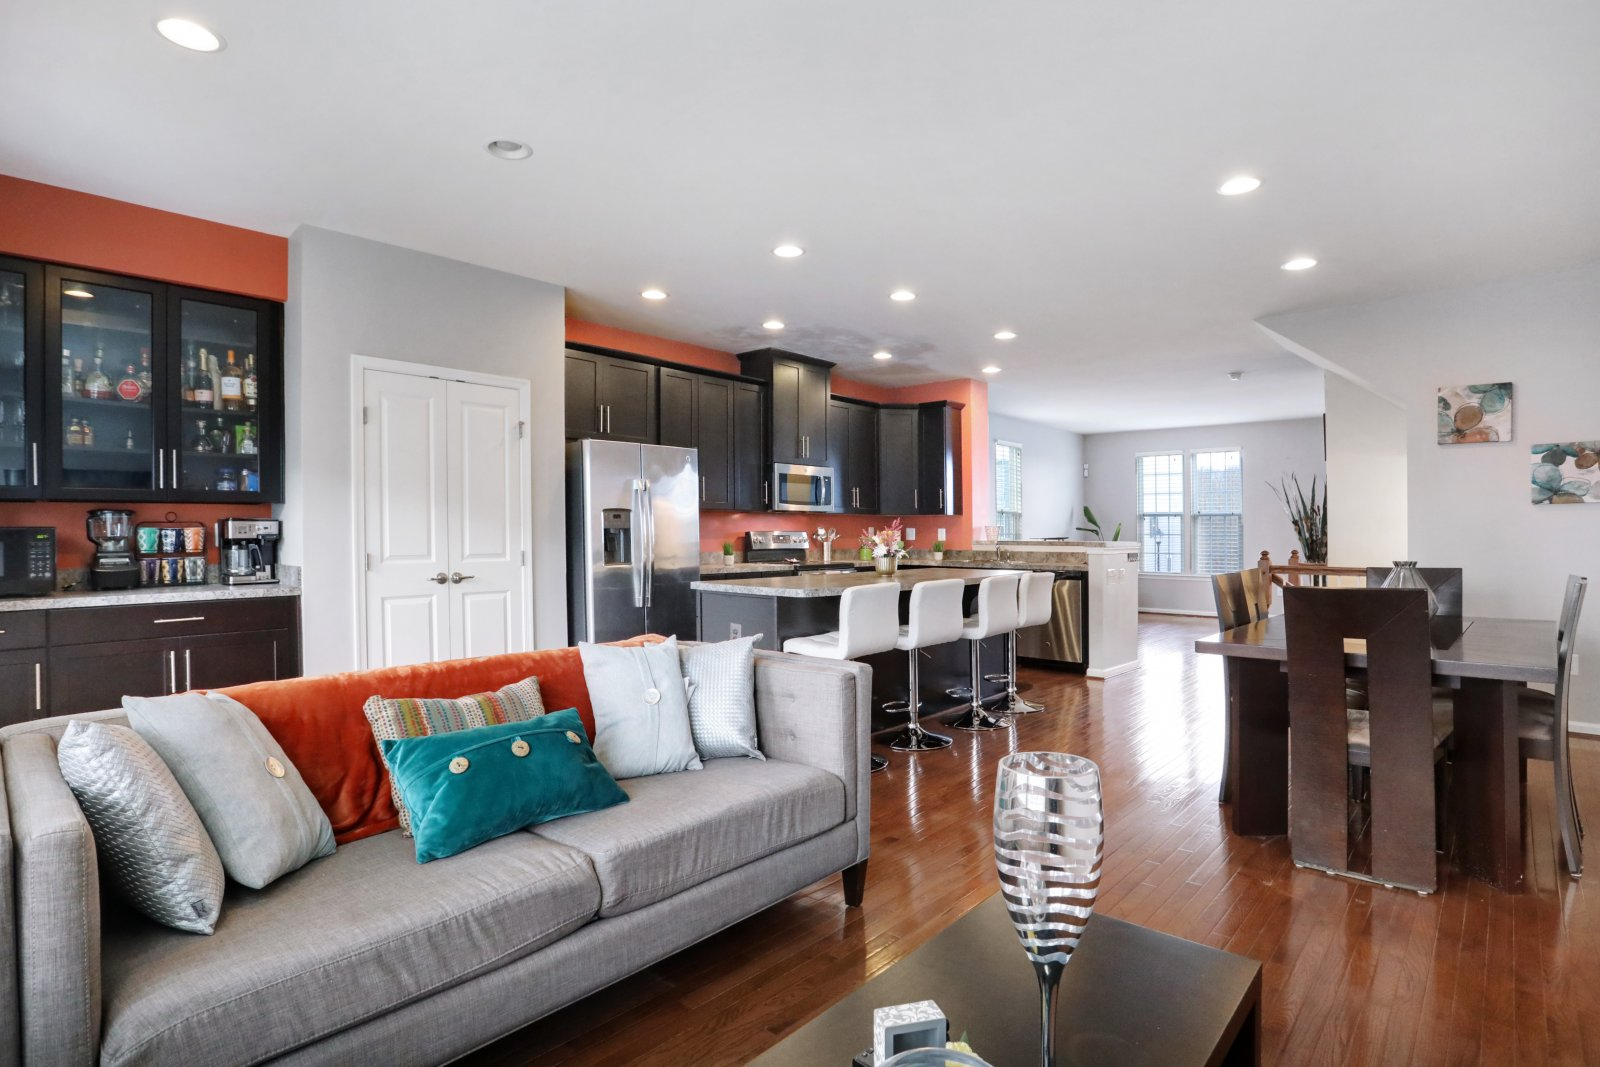 2nd level- Living room, dining room, Kitchen